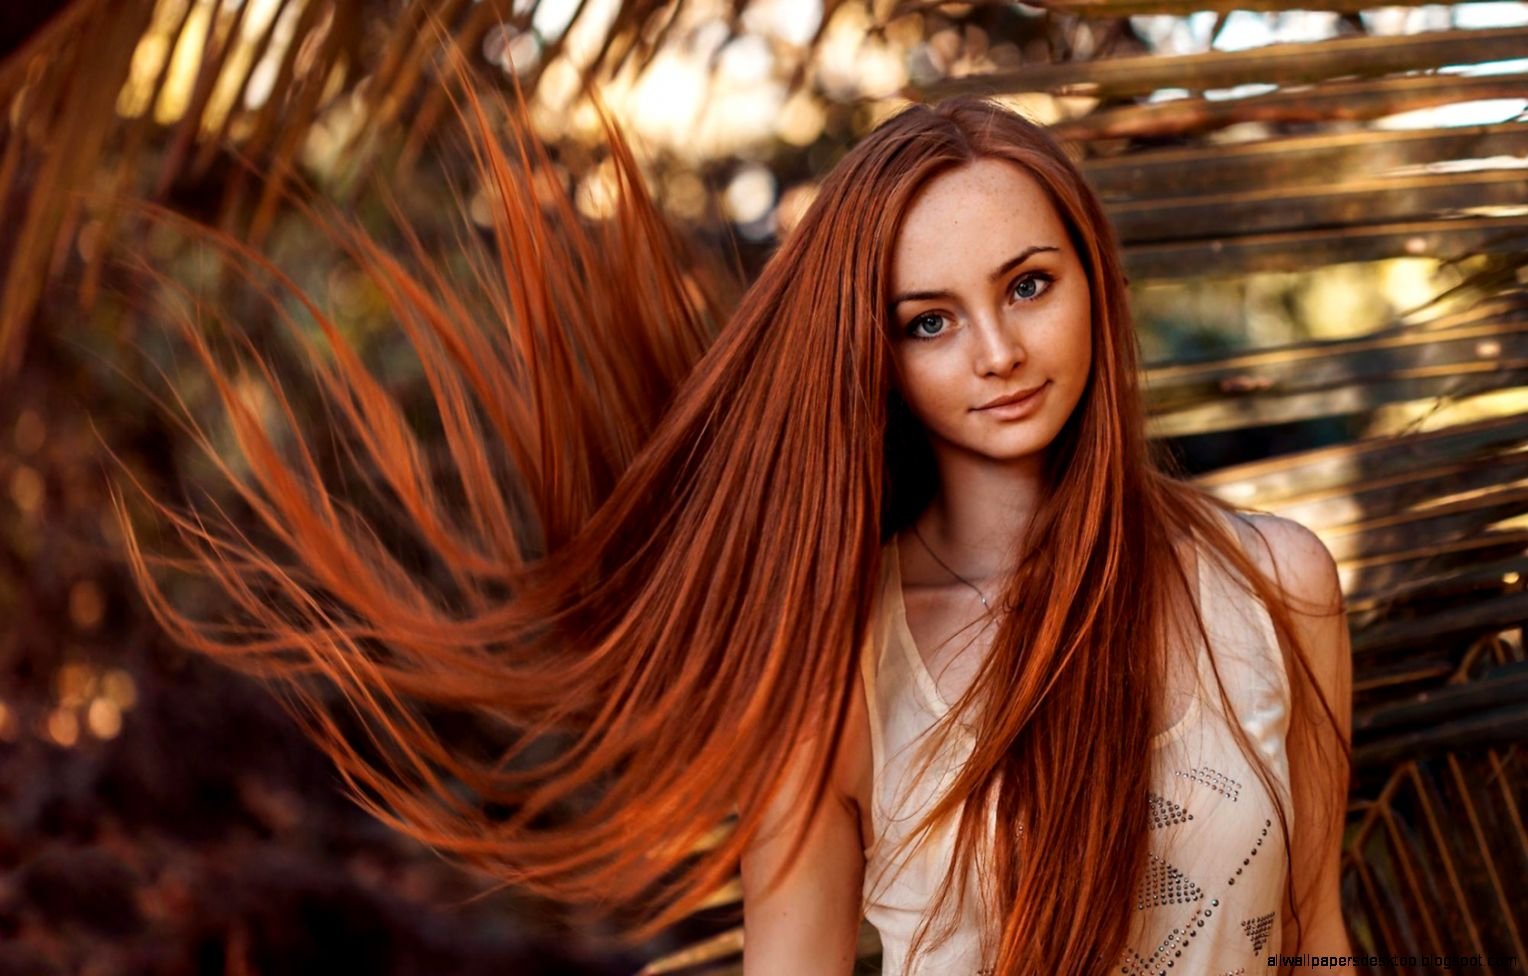 Redhead Girl Tattoos Freckles Photo 6944832